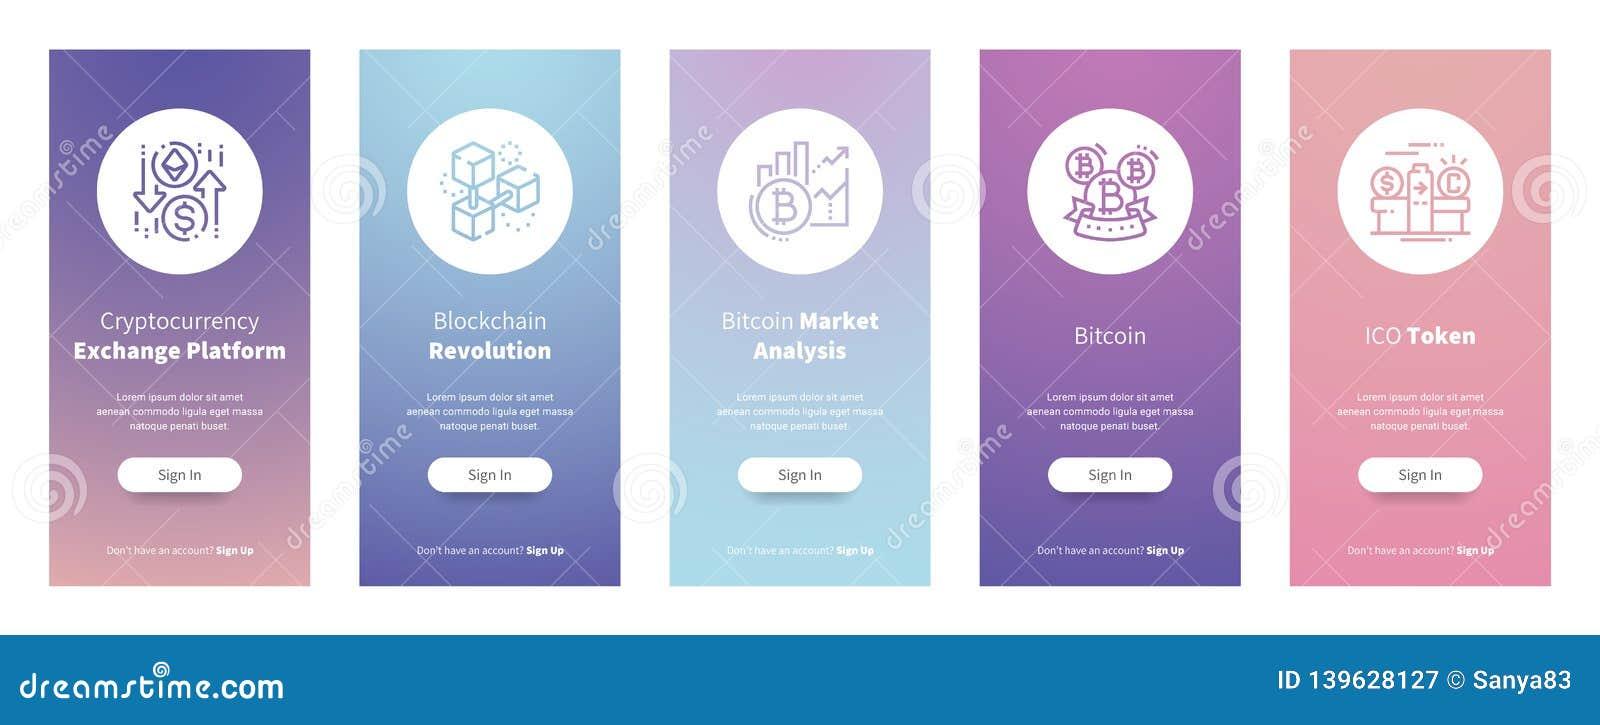 platforma crypto revolt bitcoin mining o înșelătorie